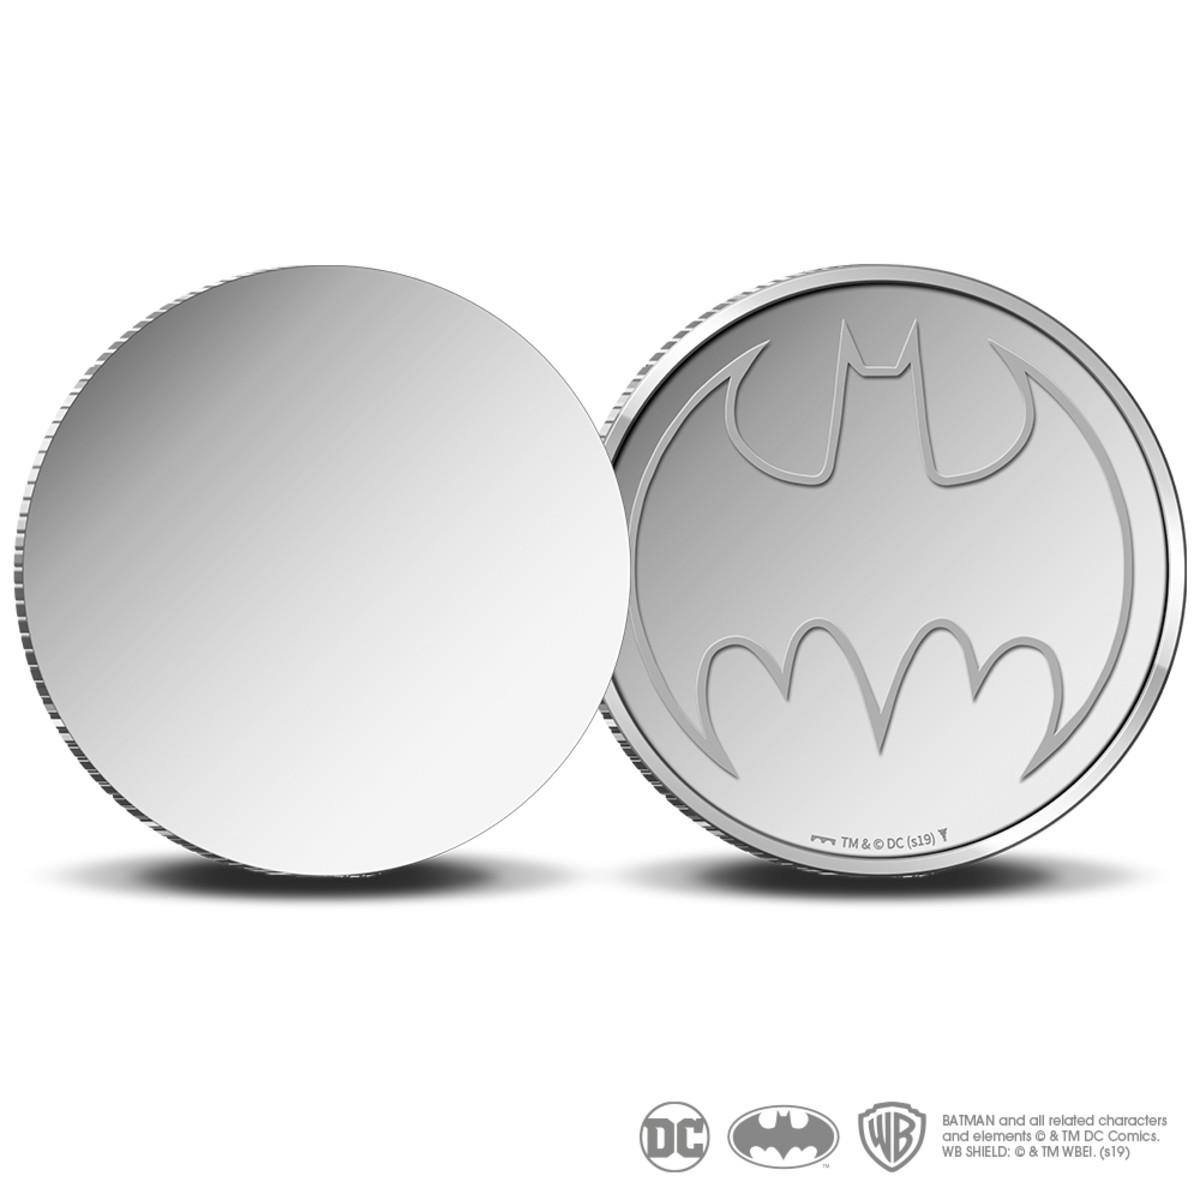 Reverse and seemingly blank obverse of Koninklijke Nederlandse Munt's Batman stainless steel round struck to mark the masked avenger's 80th birthday. Image courtesy Koninklijke Nederlandse Munt.